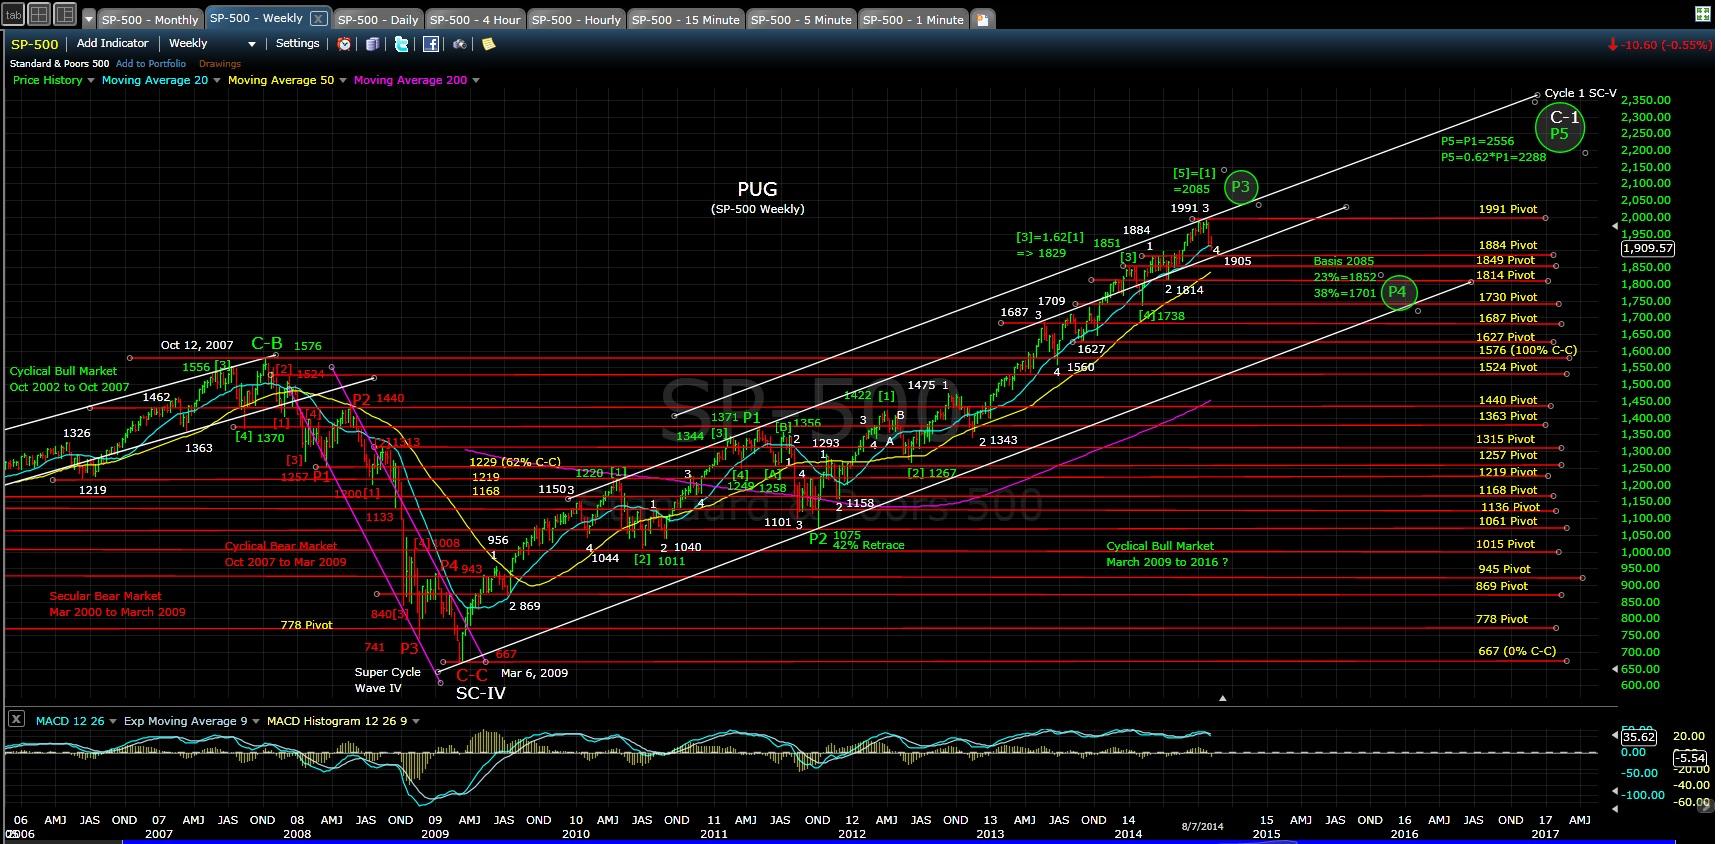 pug-sp-500-weekly-chart-eod-8-7-14